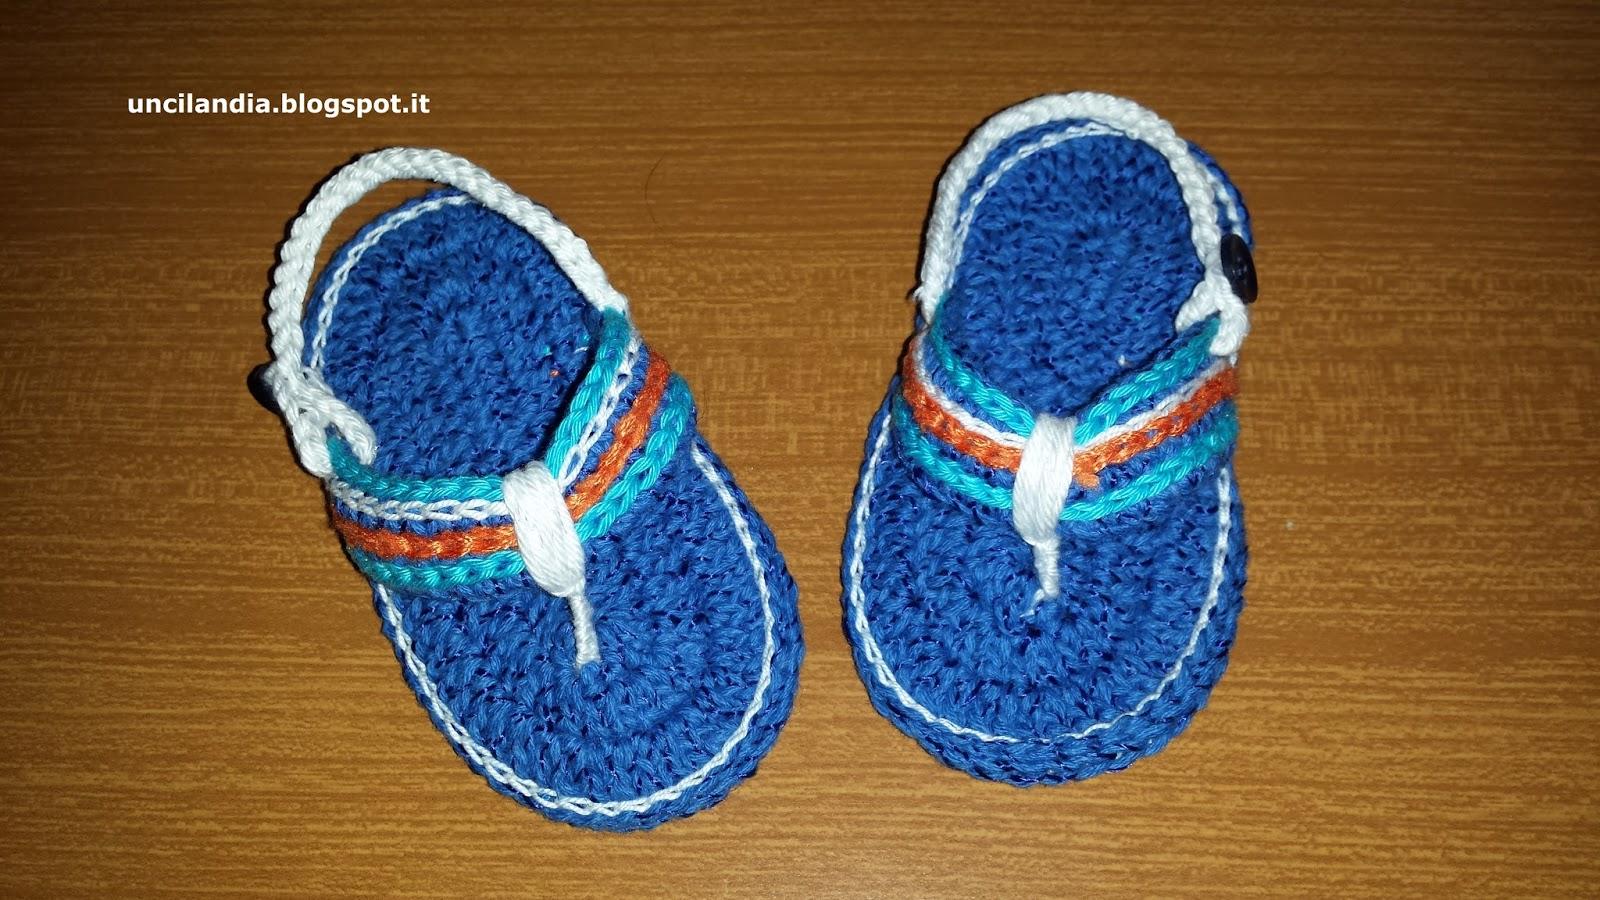 Uncilandia Infradito Alluncinetto Per Neonatocrocheted Baby